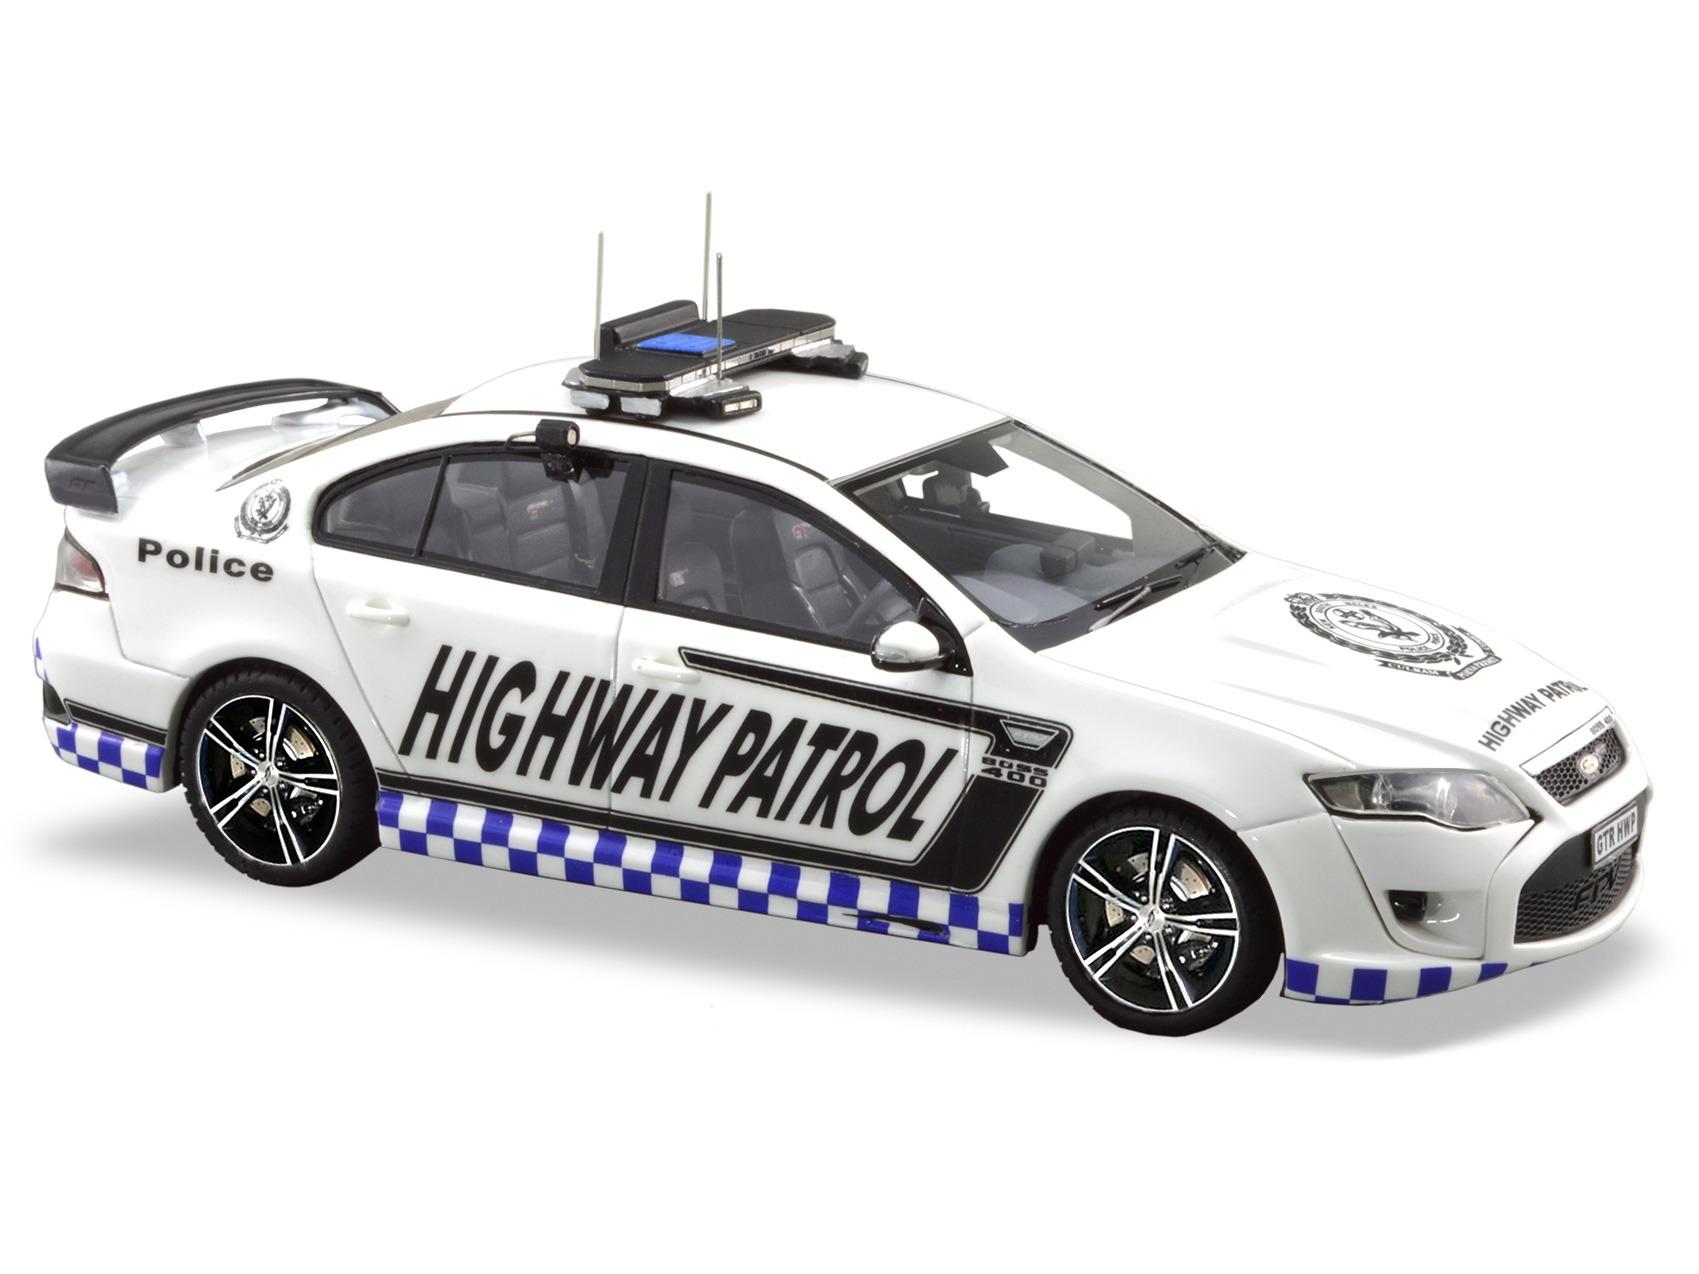 2012 FPV GT RSPEC NSW Highway Patrol – White